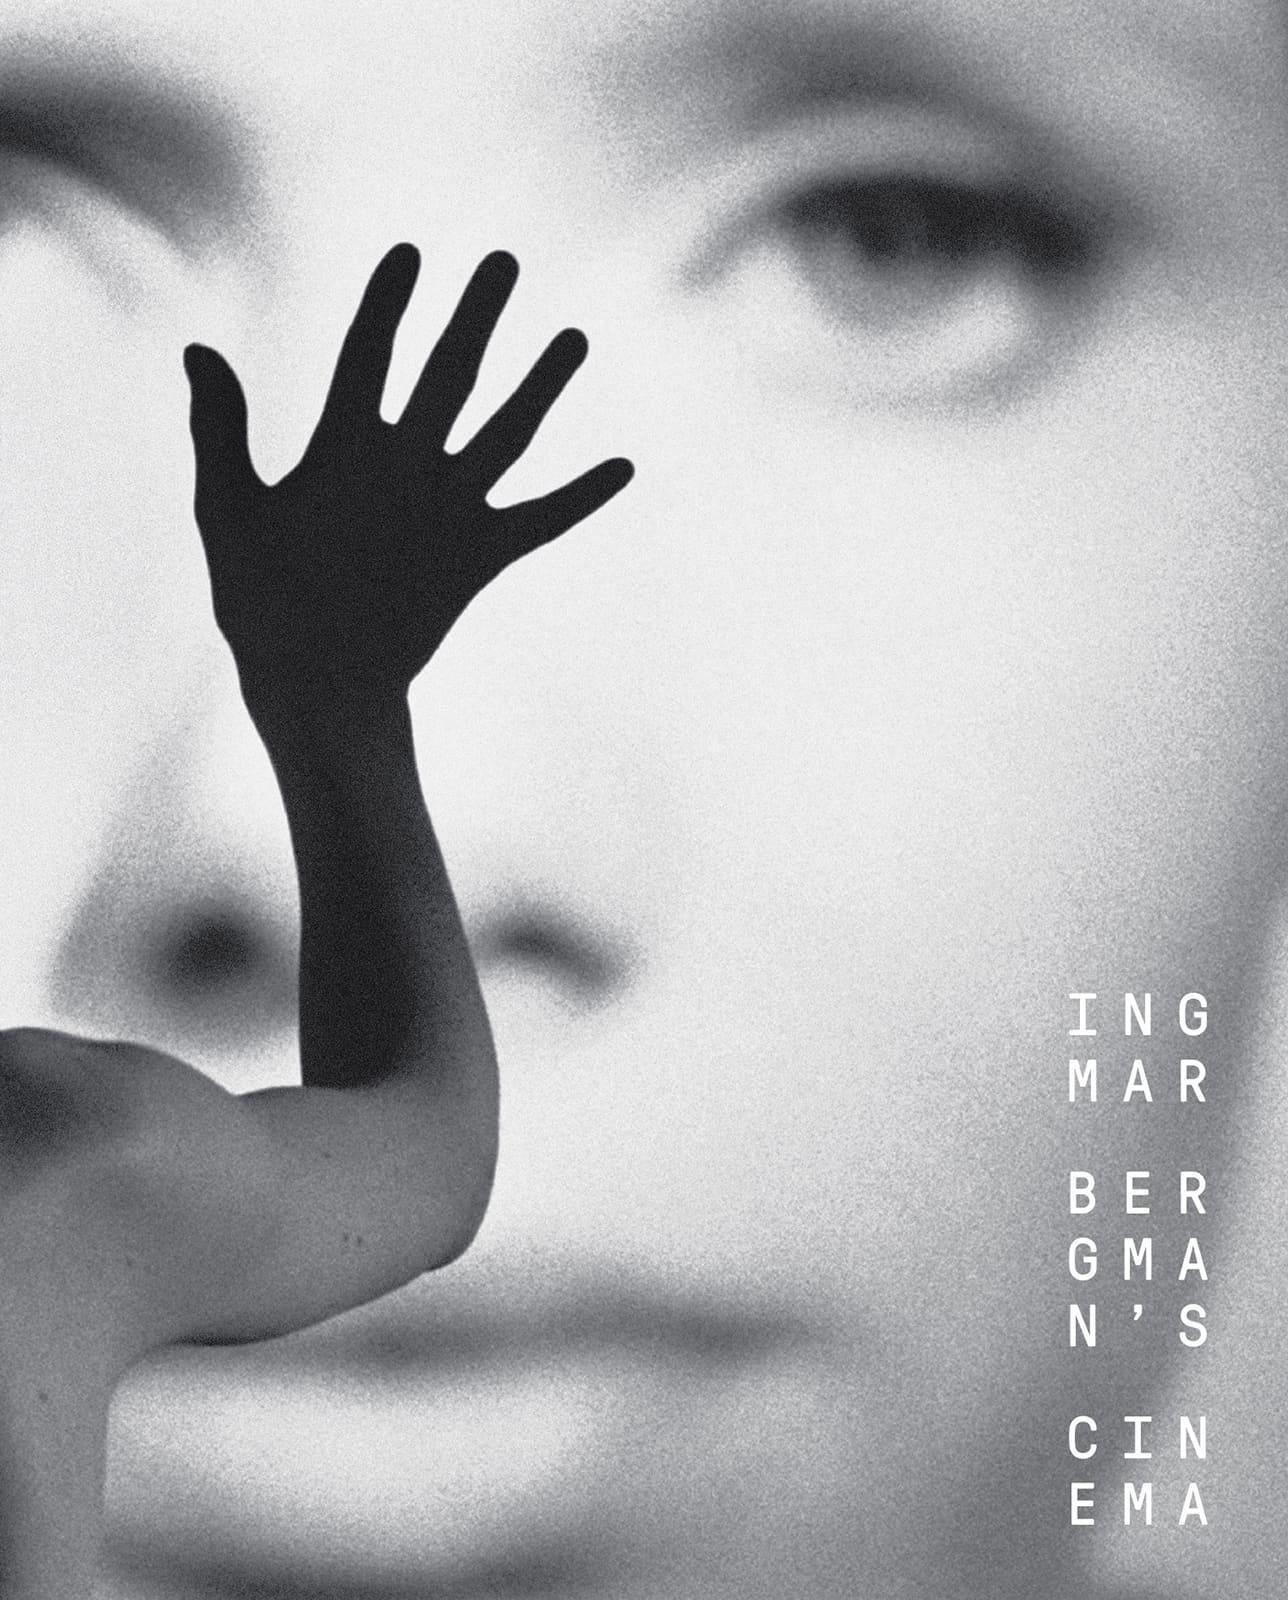 Ingmar Bergman's Cinema | The Criterion Collection